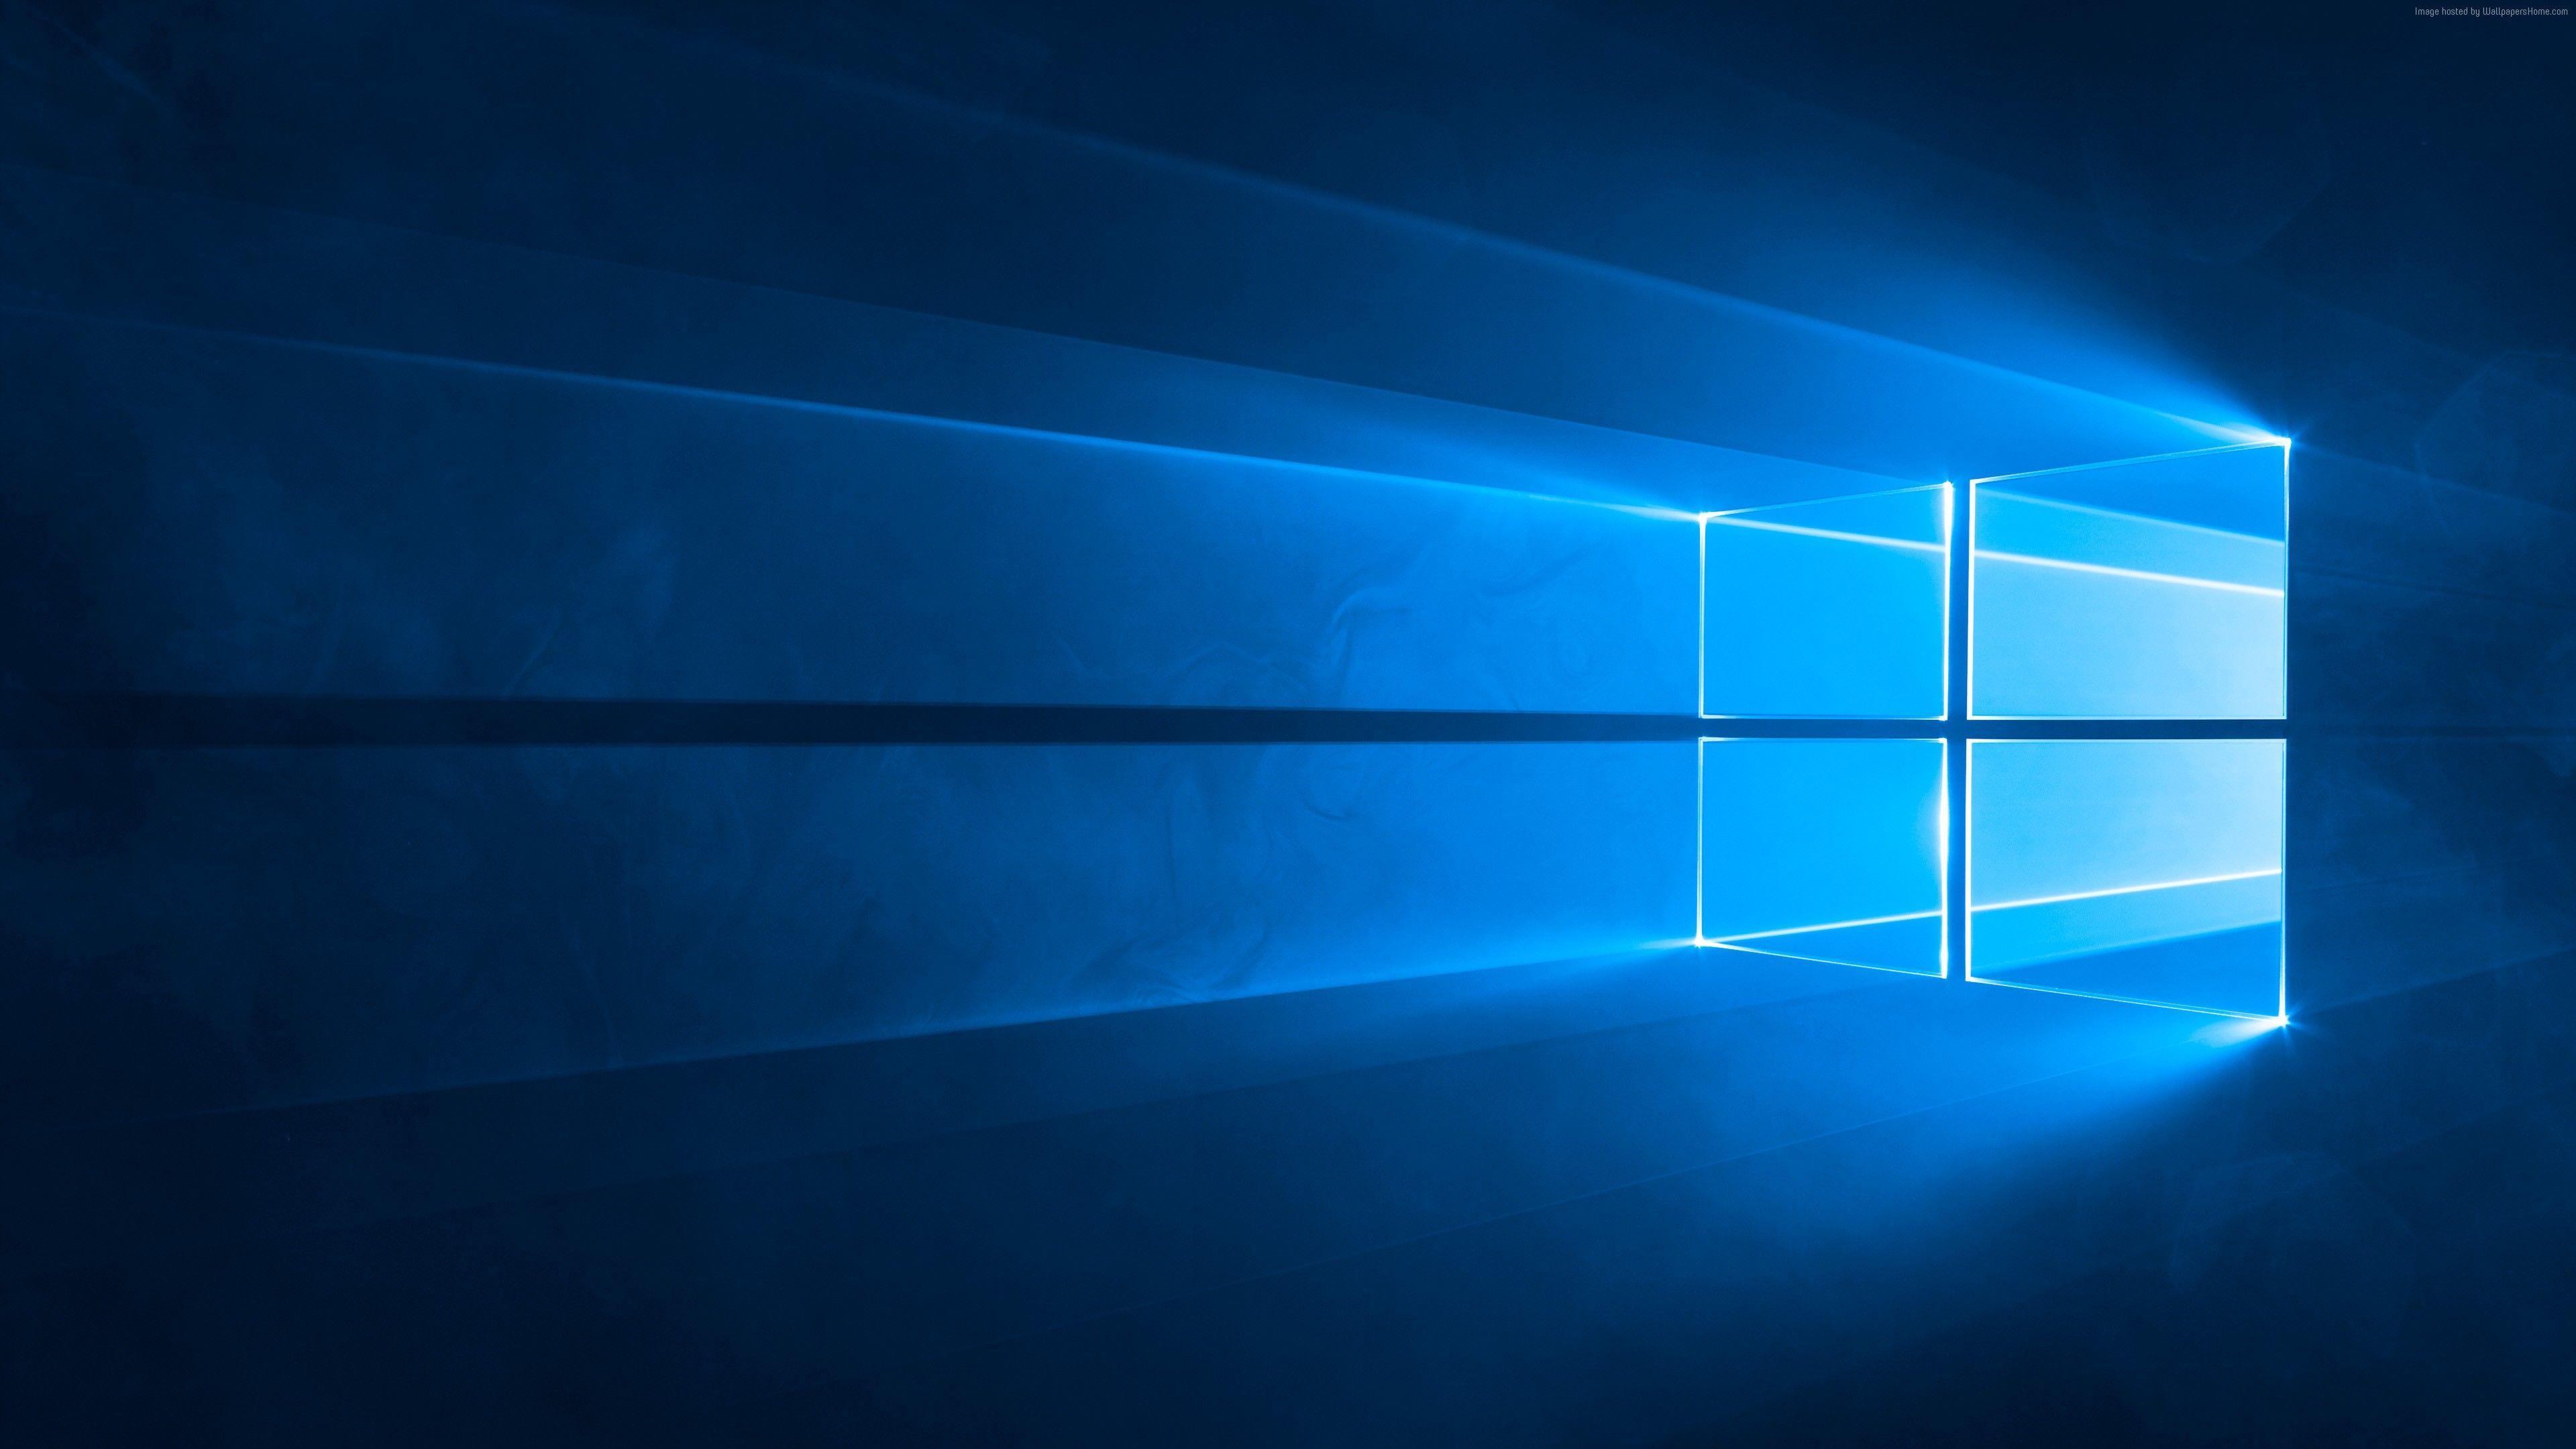 Microsoft 4k Wallpapers Top Free Microsoft 4k Backgrounds Wallpaperaccess